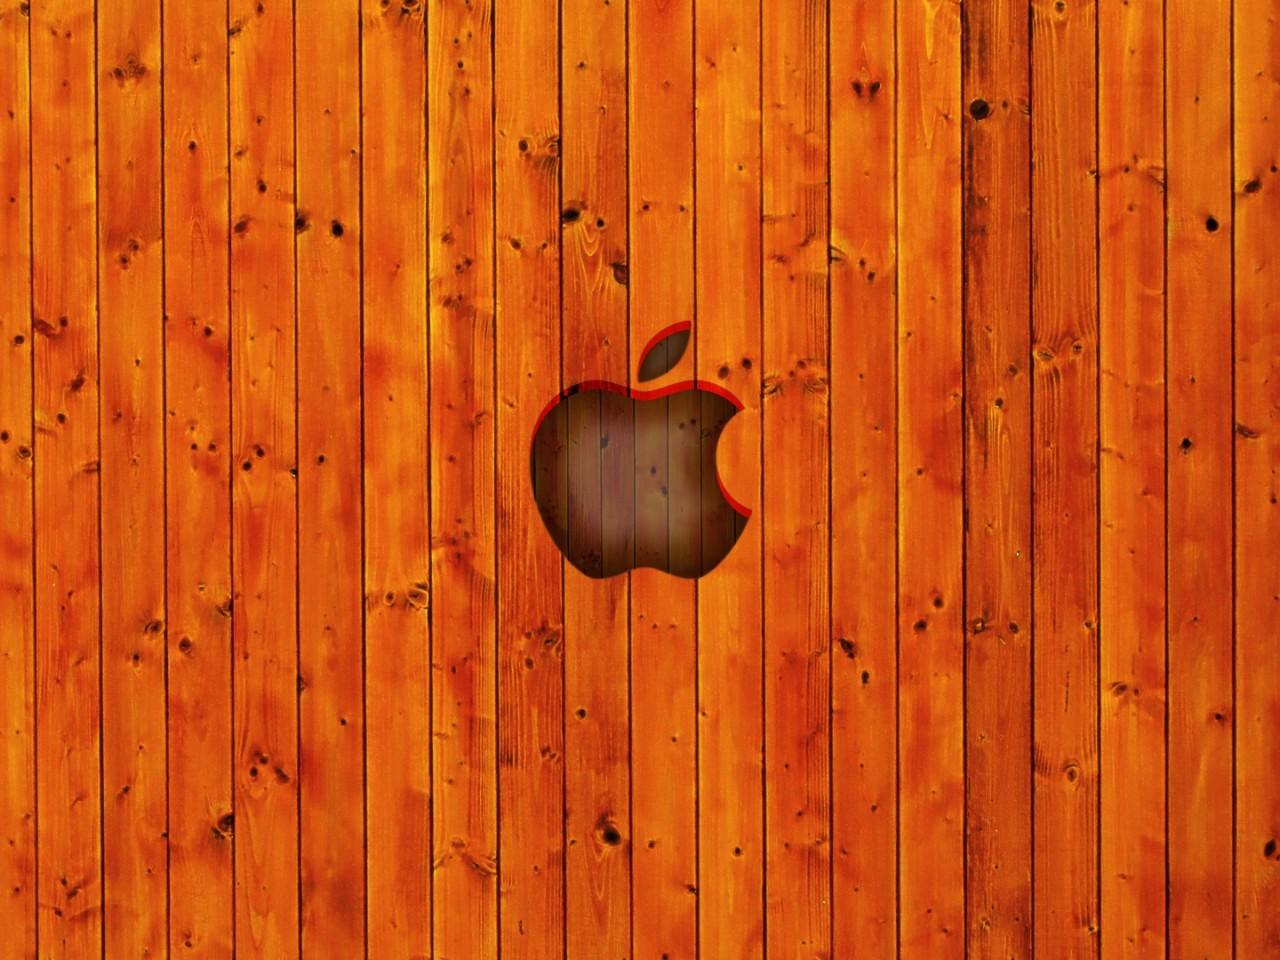 apple wooden wallpaper - hd wallpapers